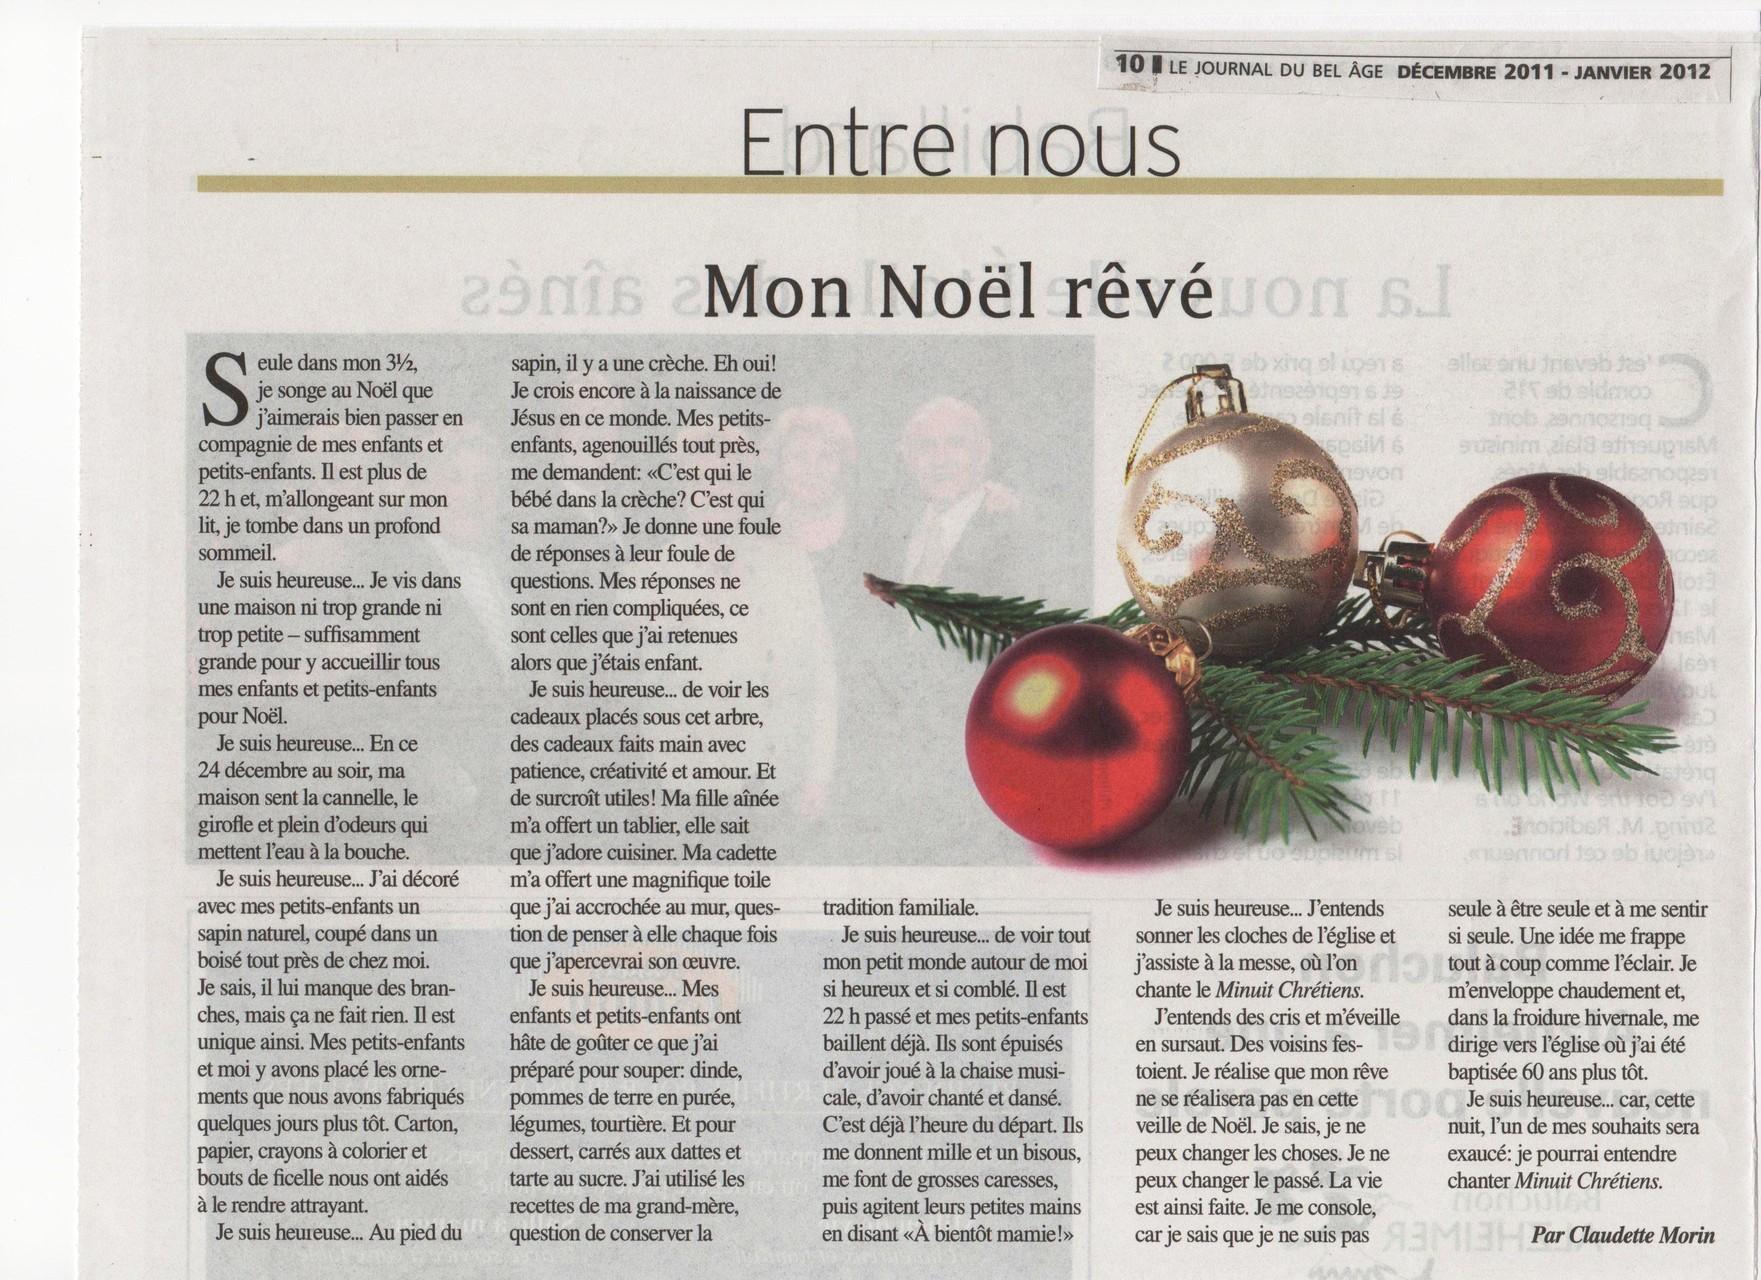 Mon Noël rêvé, TC Média, Le Bel Âge 2010